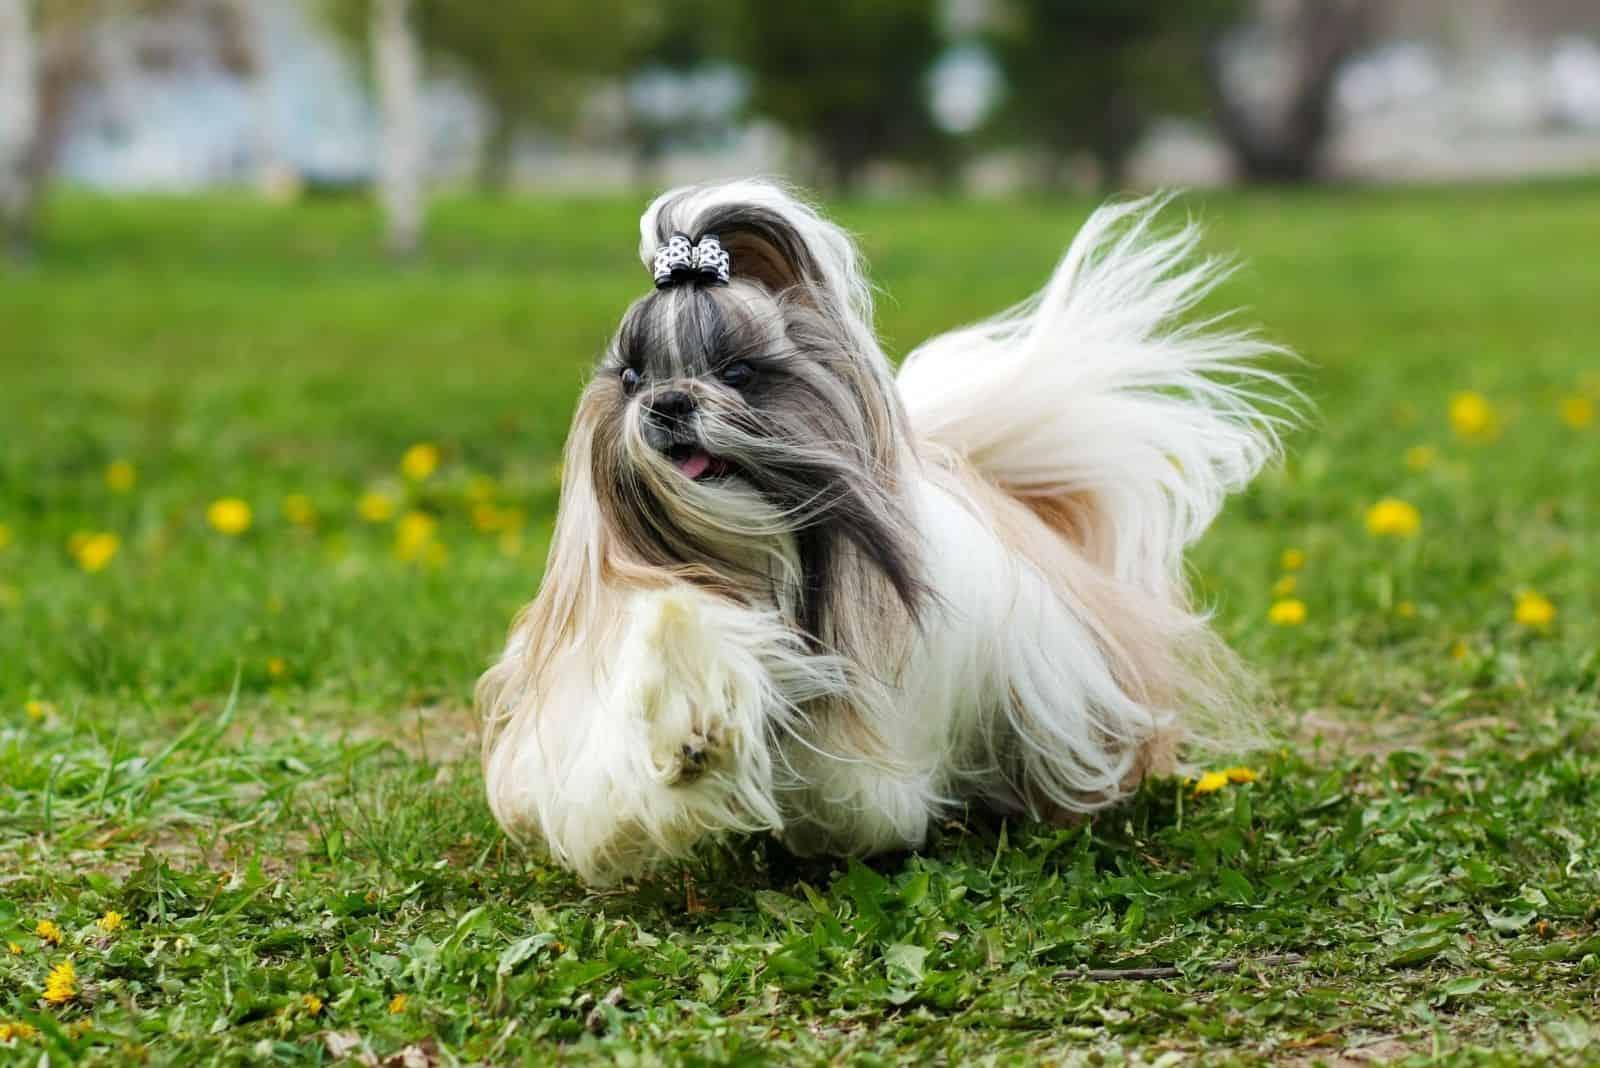 decorative shih tzu dog running in the garden